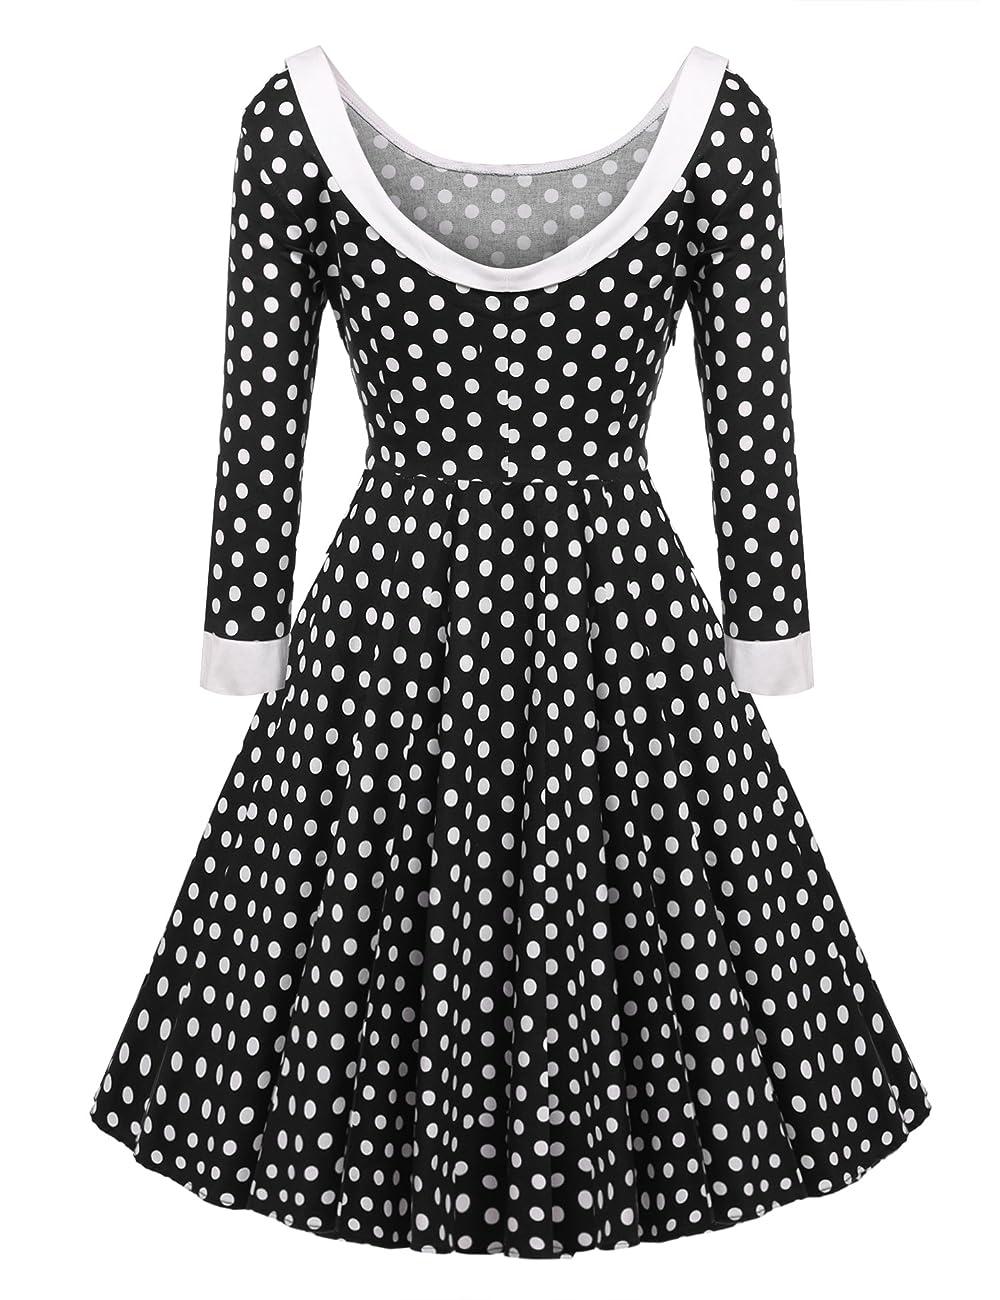 ACEVOG Women's Vintage 50s Elegant Polka Dot Formal Casual Party Dress 2